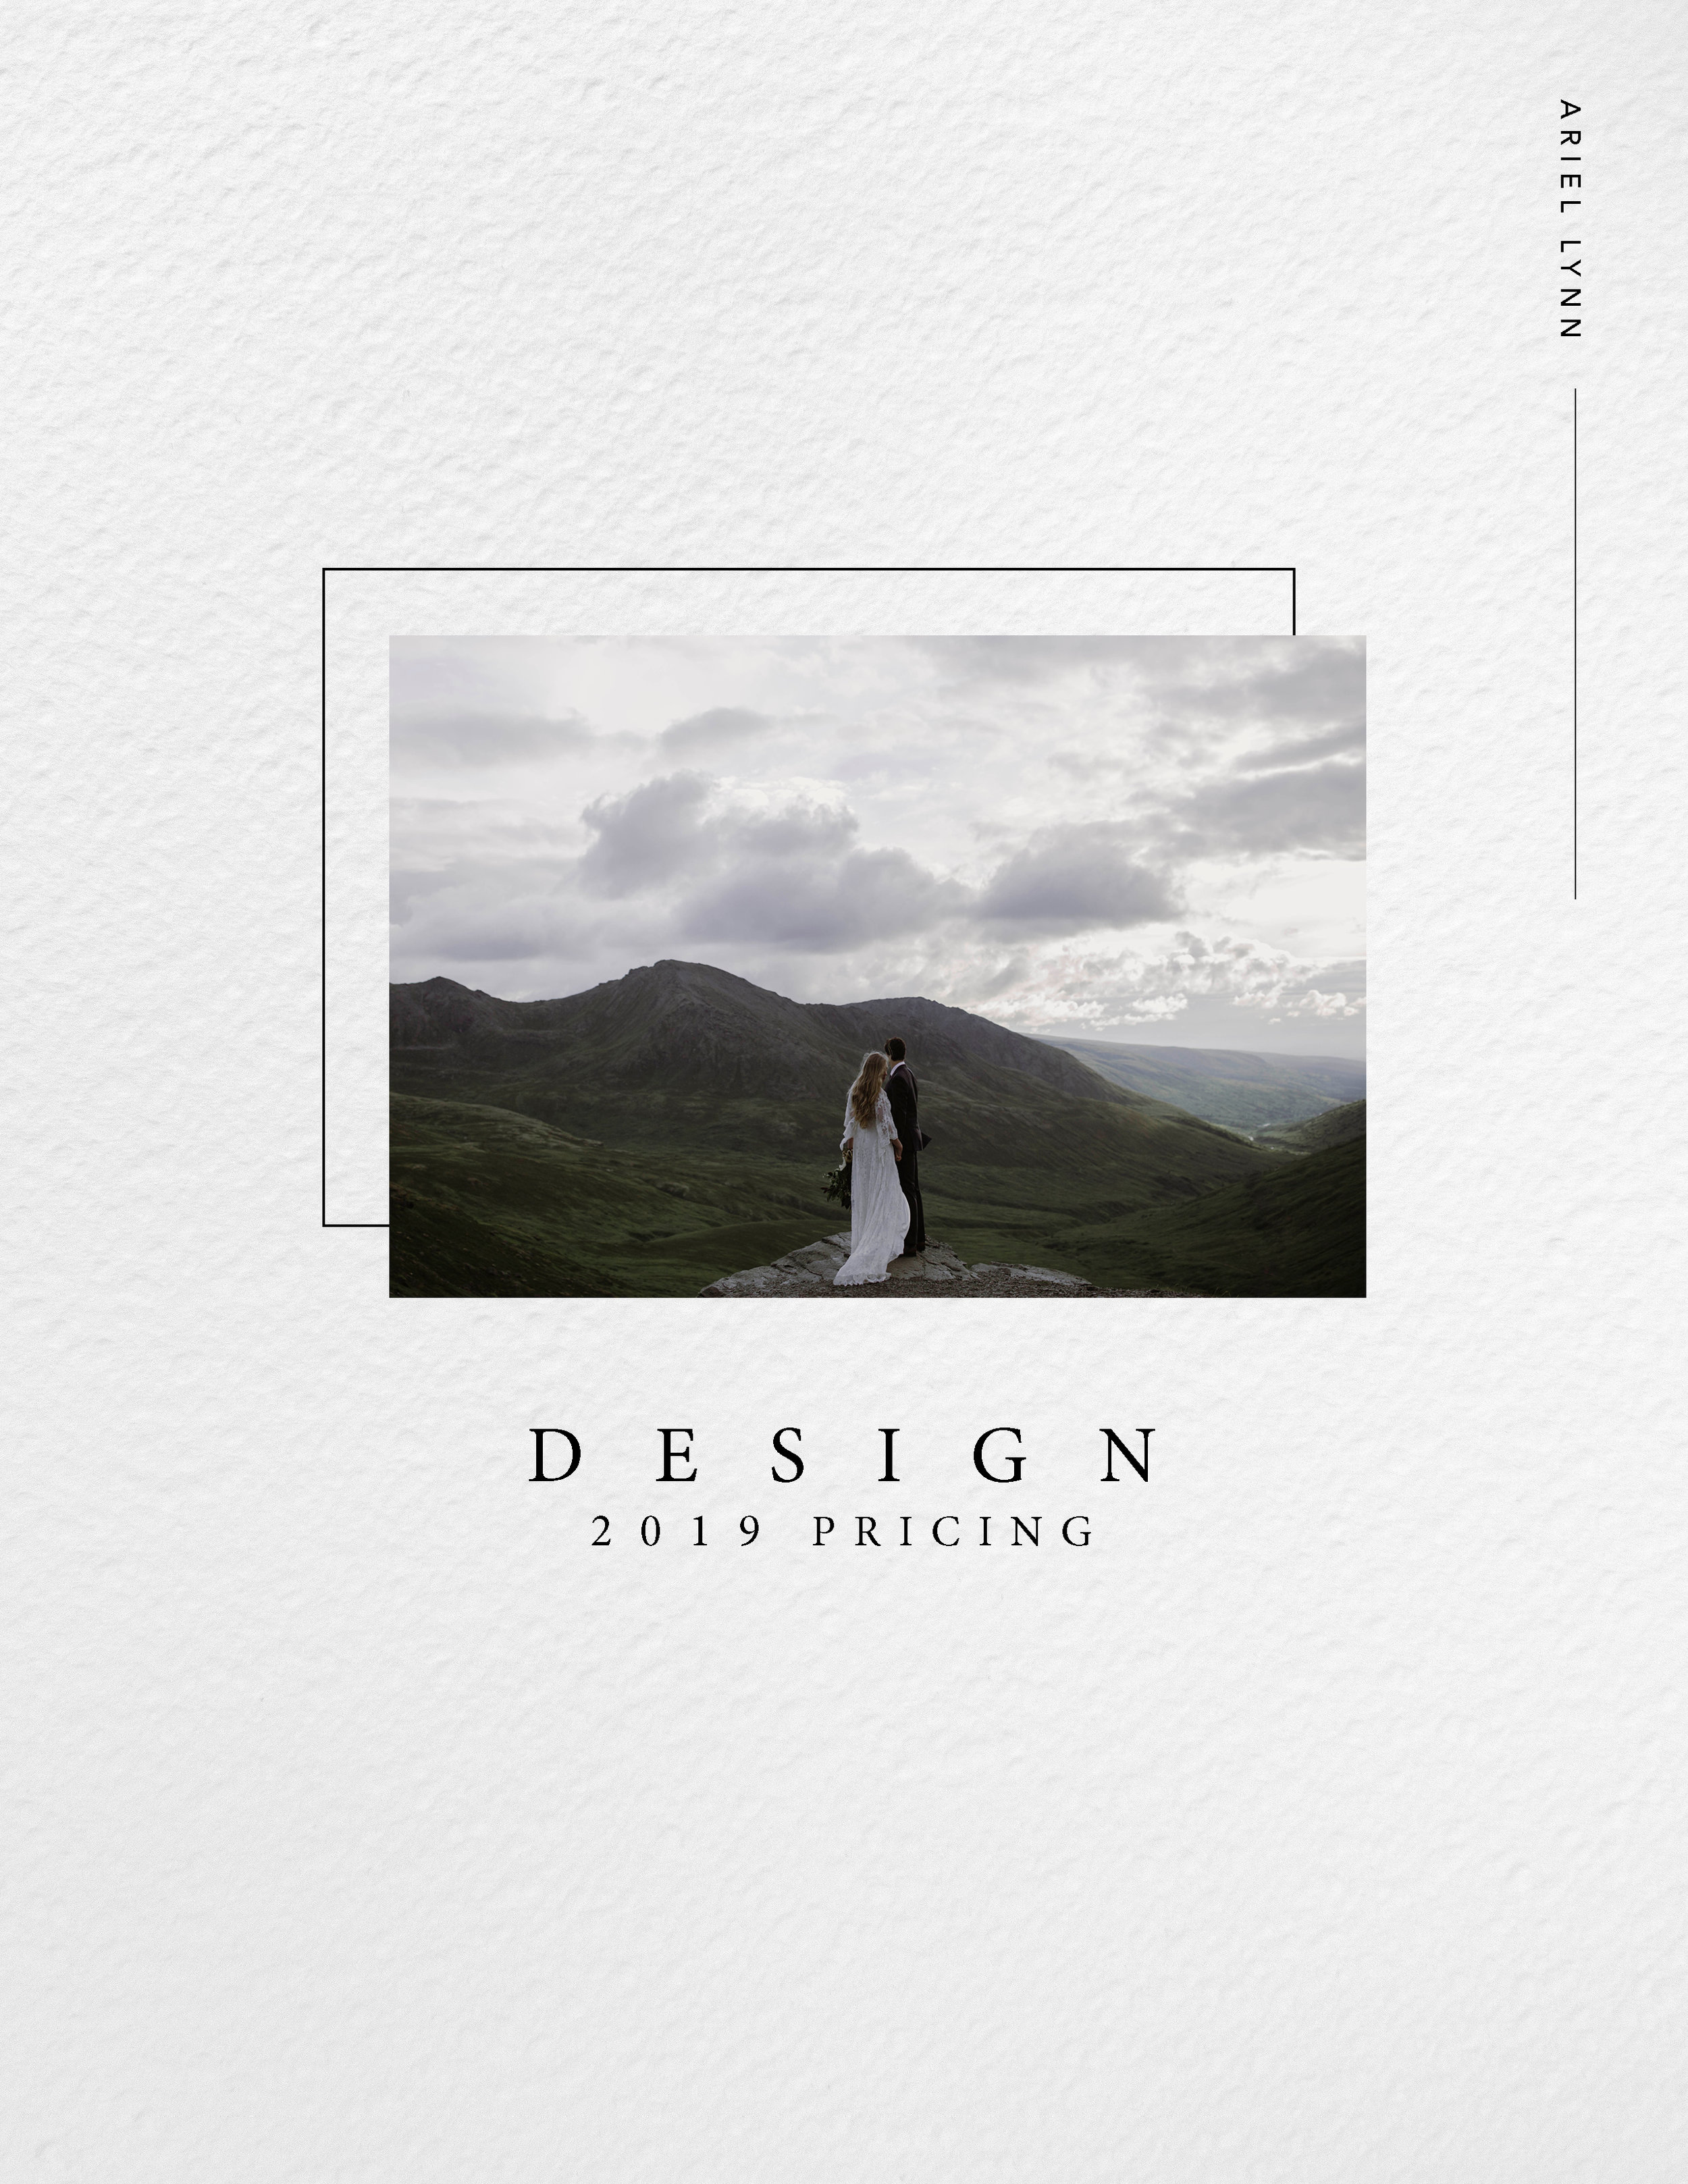 DESIGN-PRICING.jpg